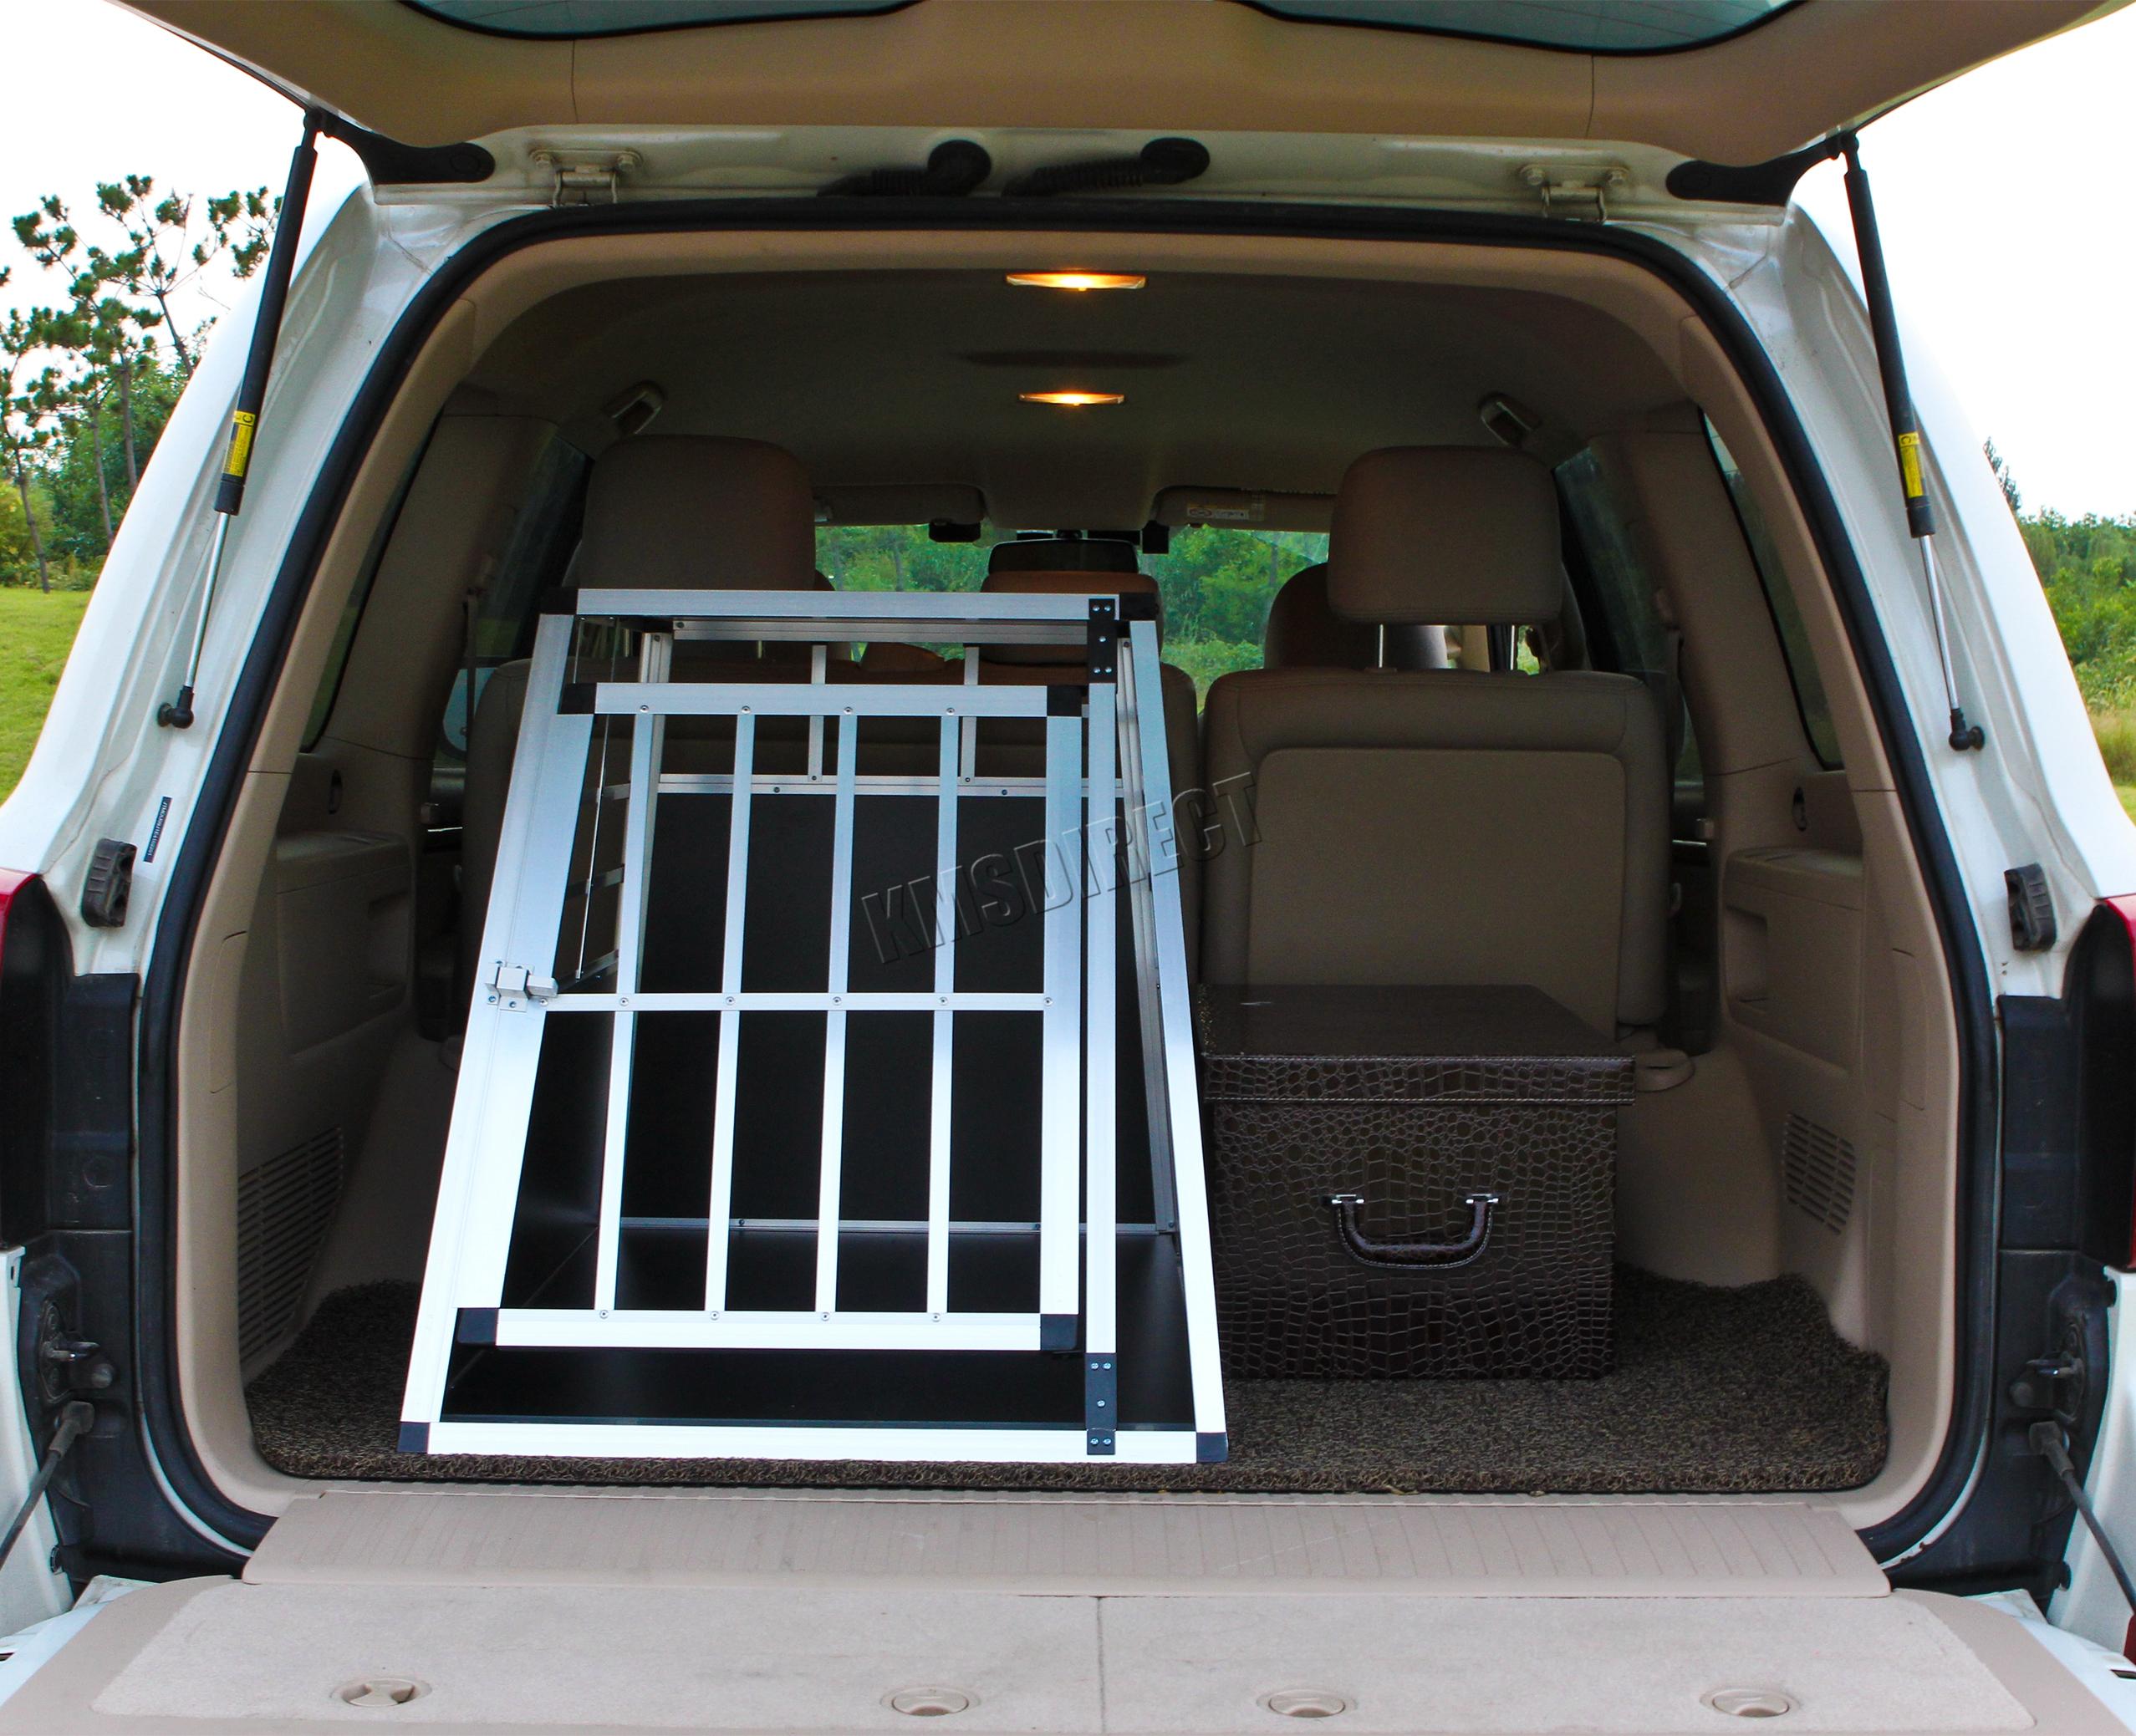 foxhunter aluminium chien cage pour animaux de compagnie. Black Bedroom Furniture Sets. Home Design Ideas